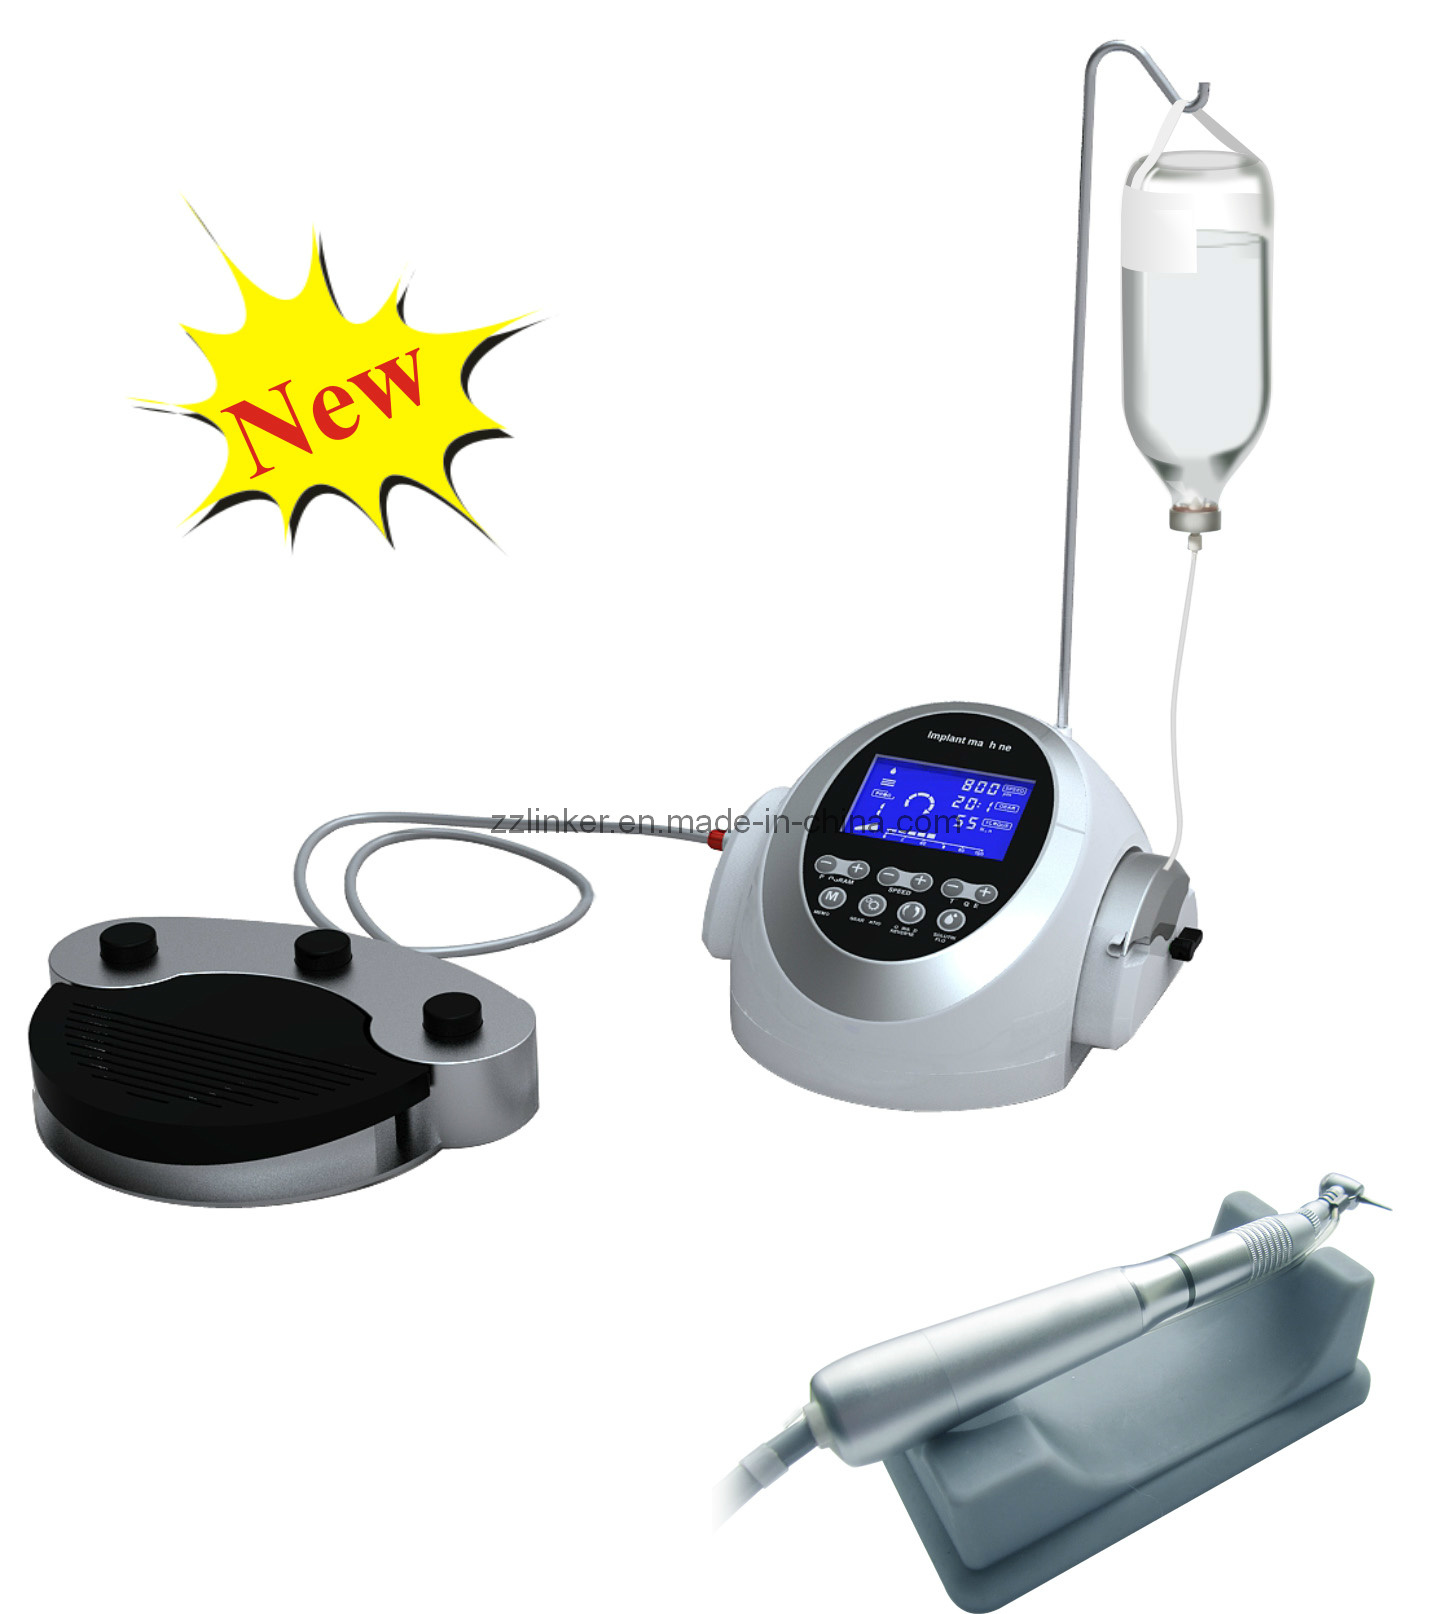 Coxo C-Sailor Dental Implant Surgery System/Coxo Implant Machine/C-Sailor Implant Motor